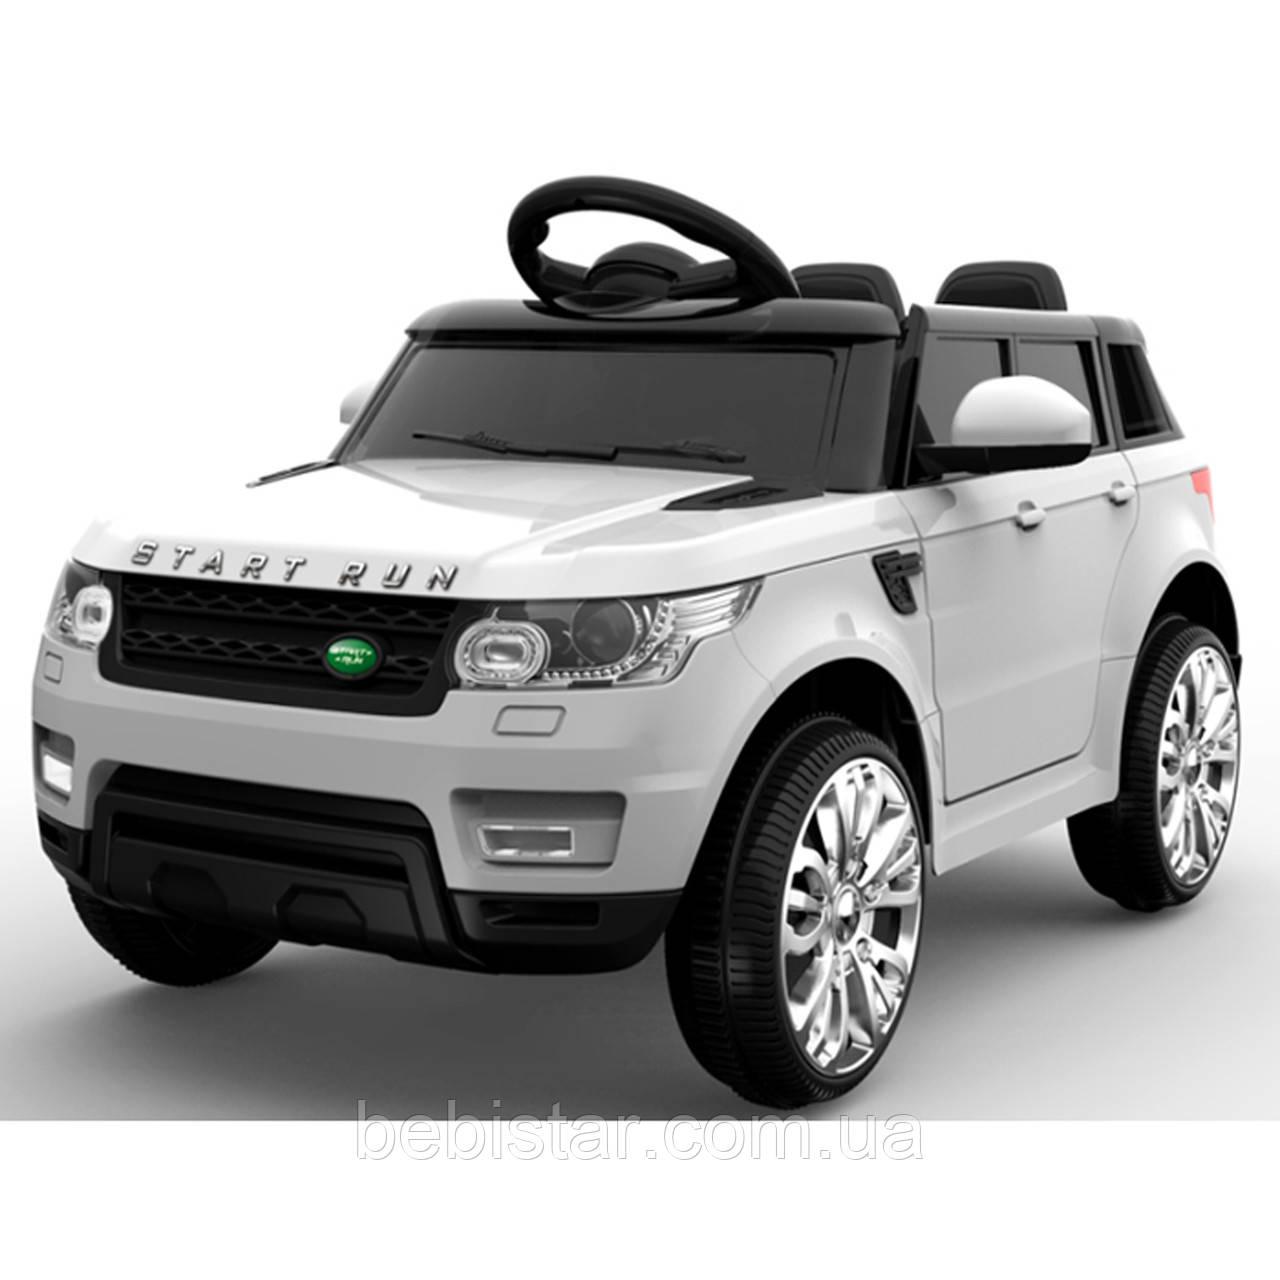 Детский электромобиль FL1638 (T-7815) WHITE деткам 3-8 лет